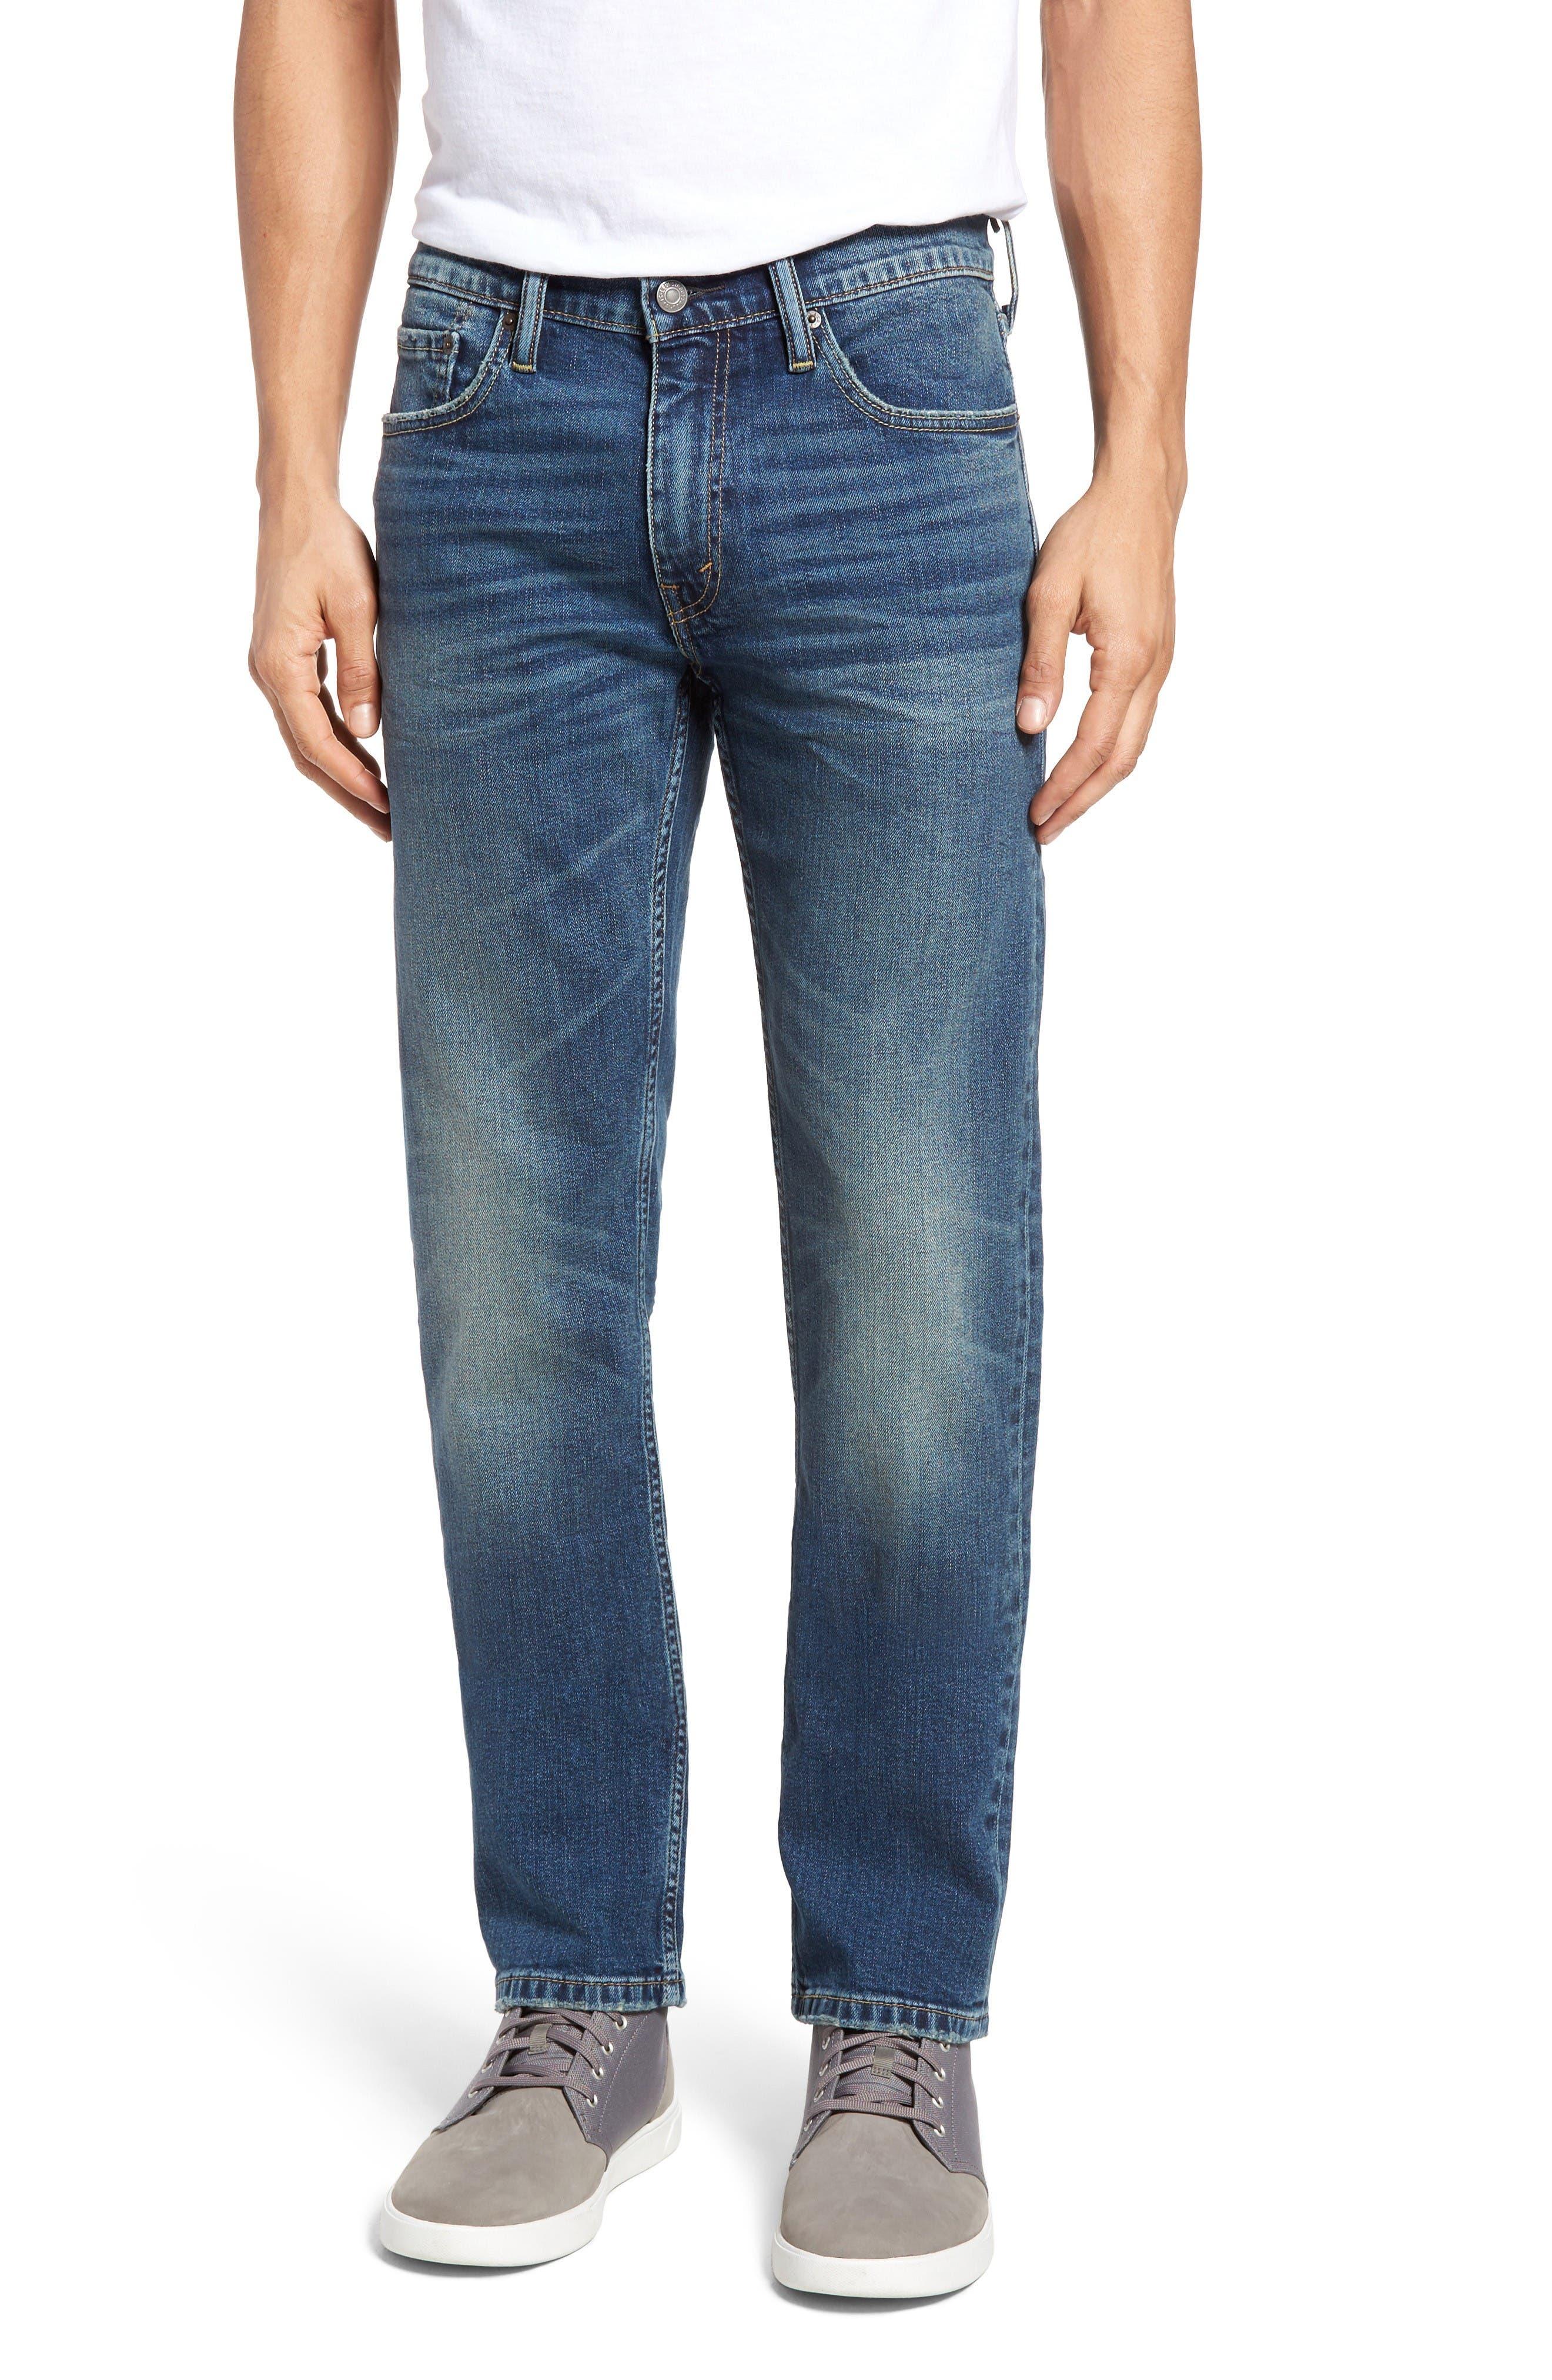 Main Image - Levi's® 511™ Slim Fit Jeans (Emgee)